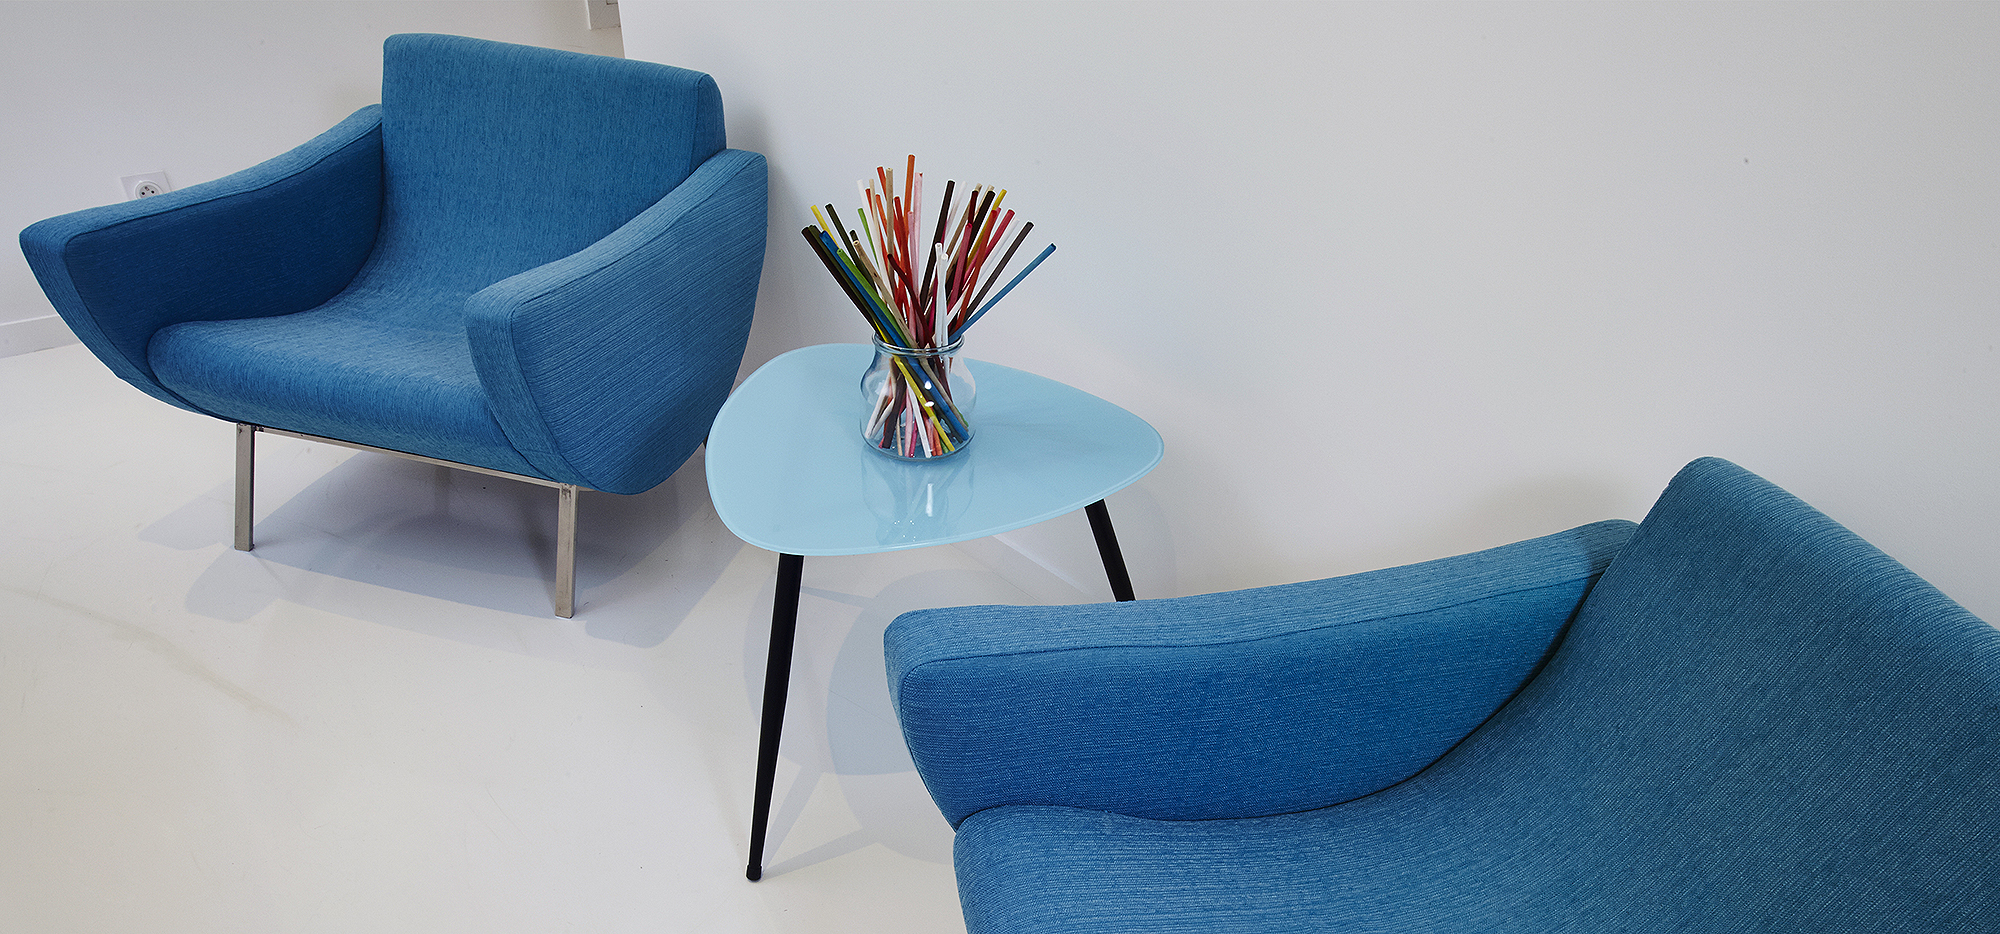 06_fauteuil